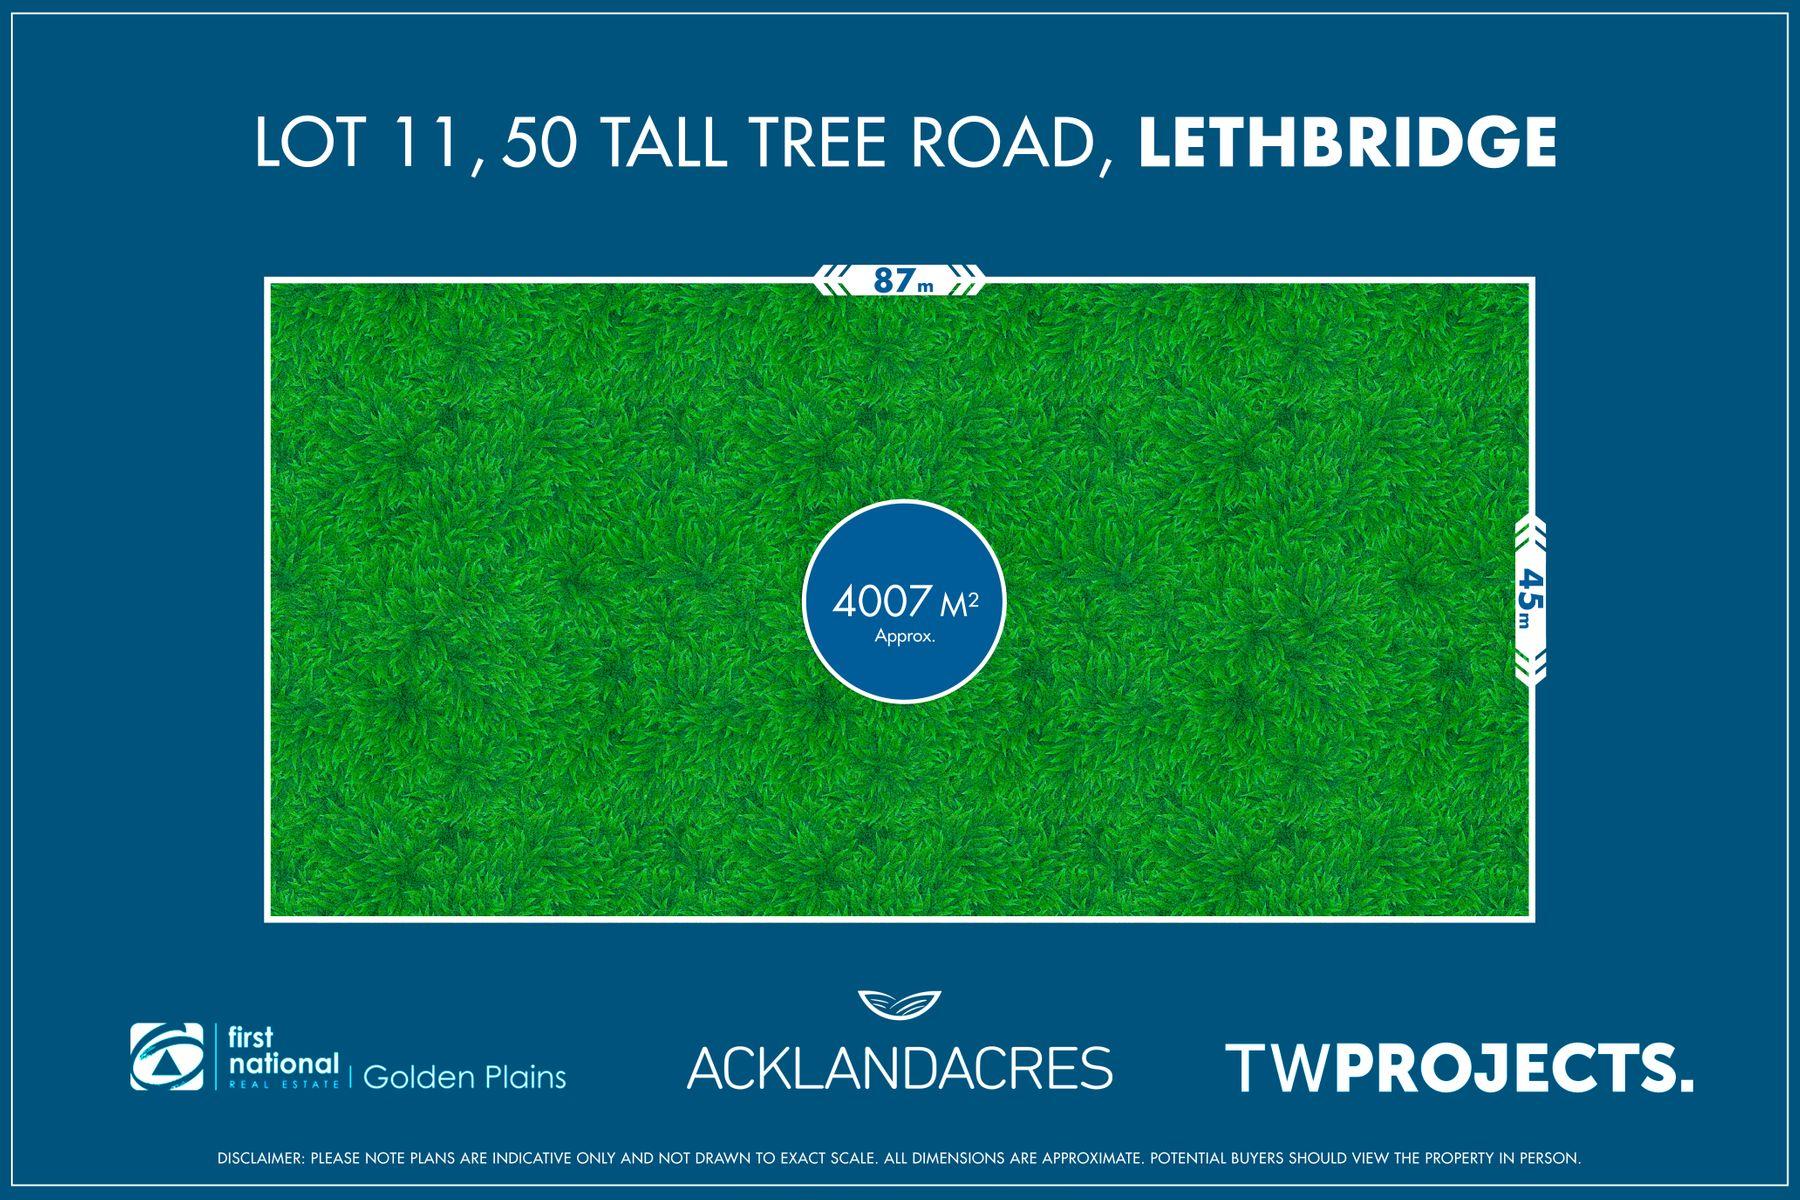 Lot 11, 50 Tall Tree Road, Lethbridge, VIC 3332